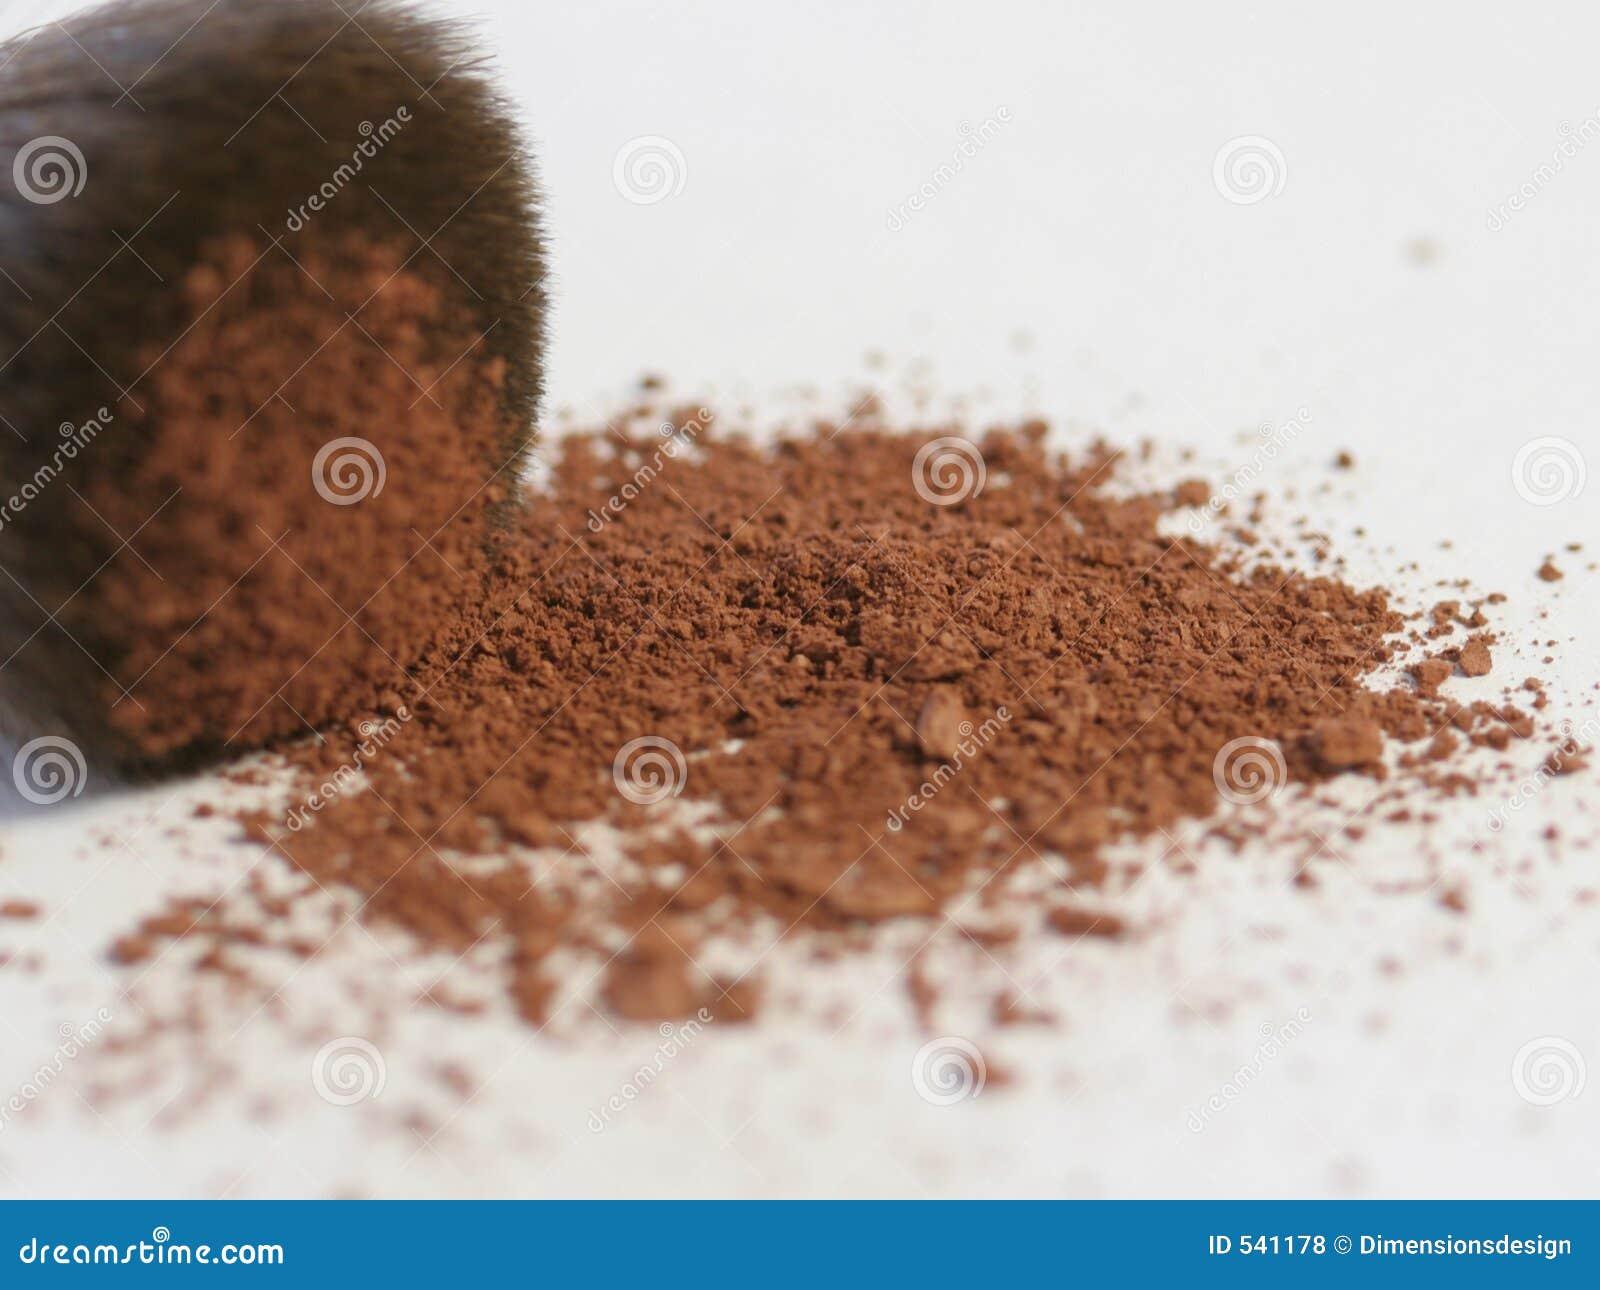 Brush with blush powder